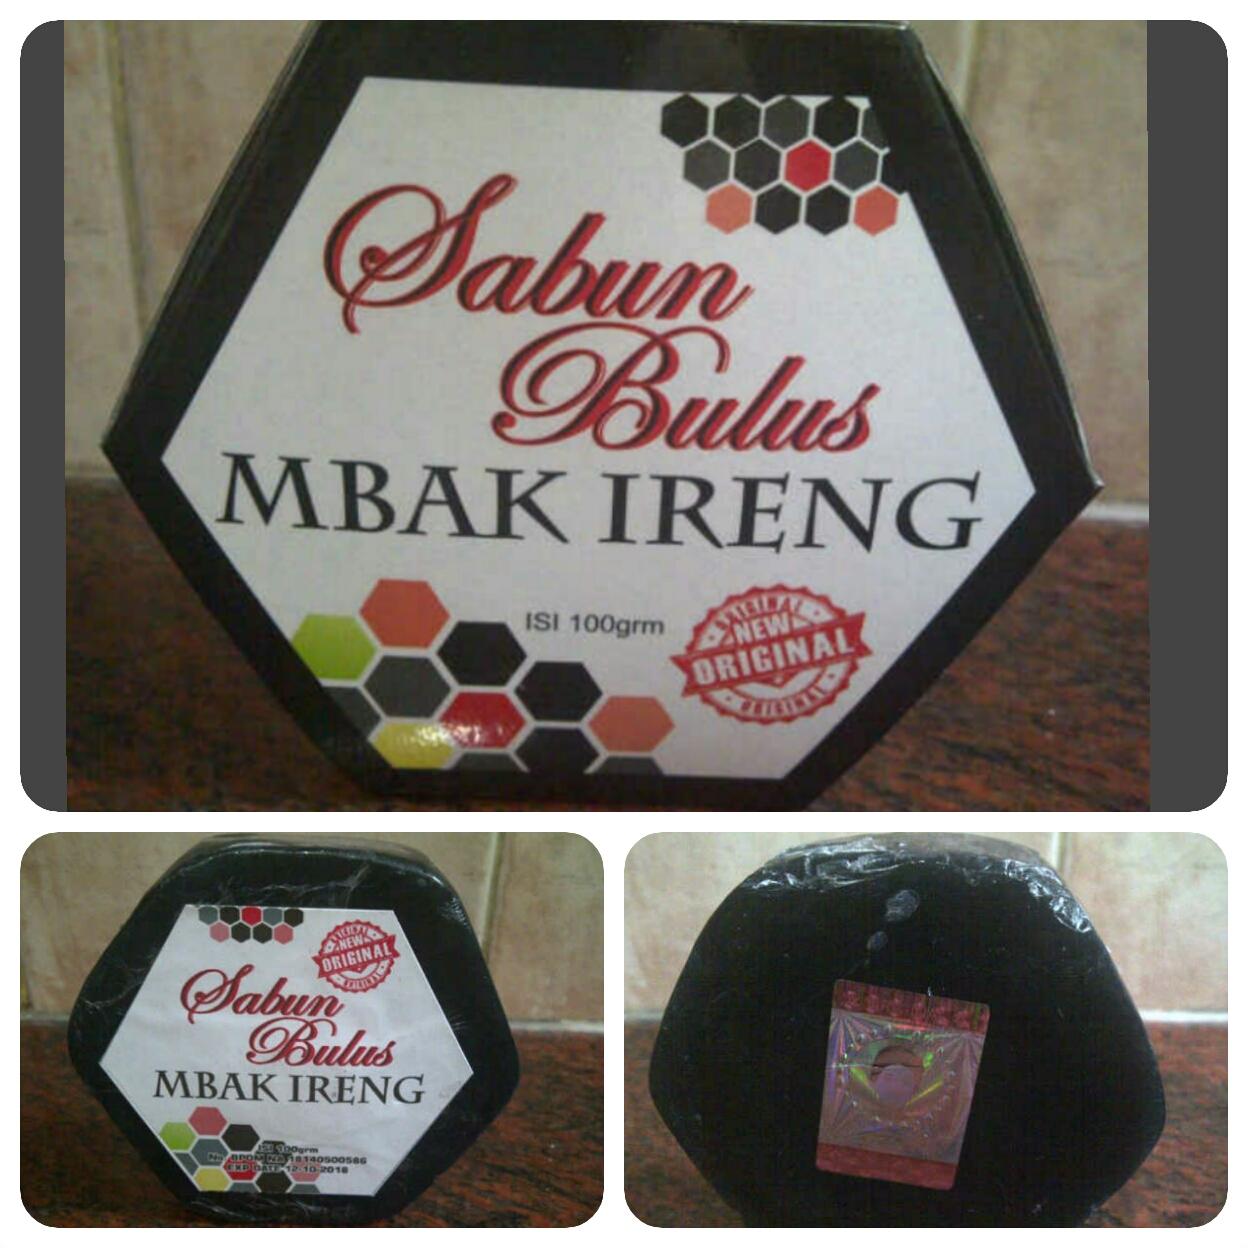 Jbs Collagen Lip Mask Masker Bibir 5 Pcs Sabun Bulus Original Mbak Source Jual Pembesar Payudara Mr P Ireng Hologram Arek